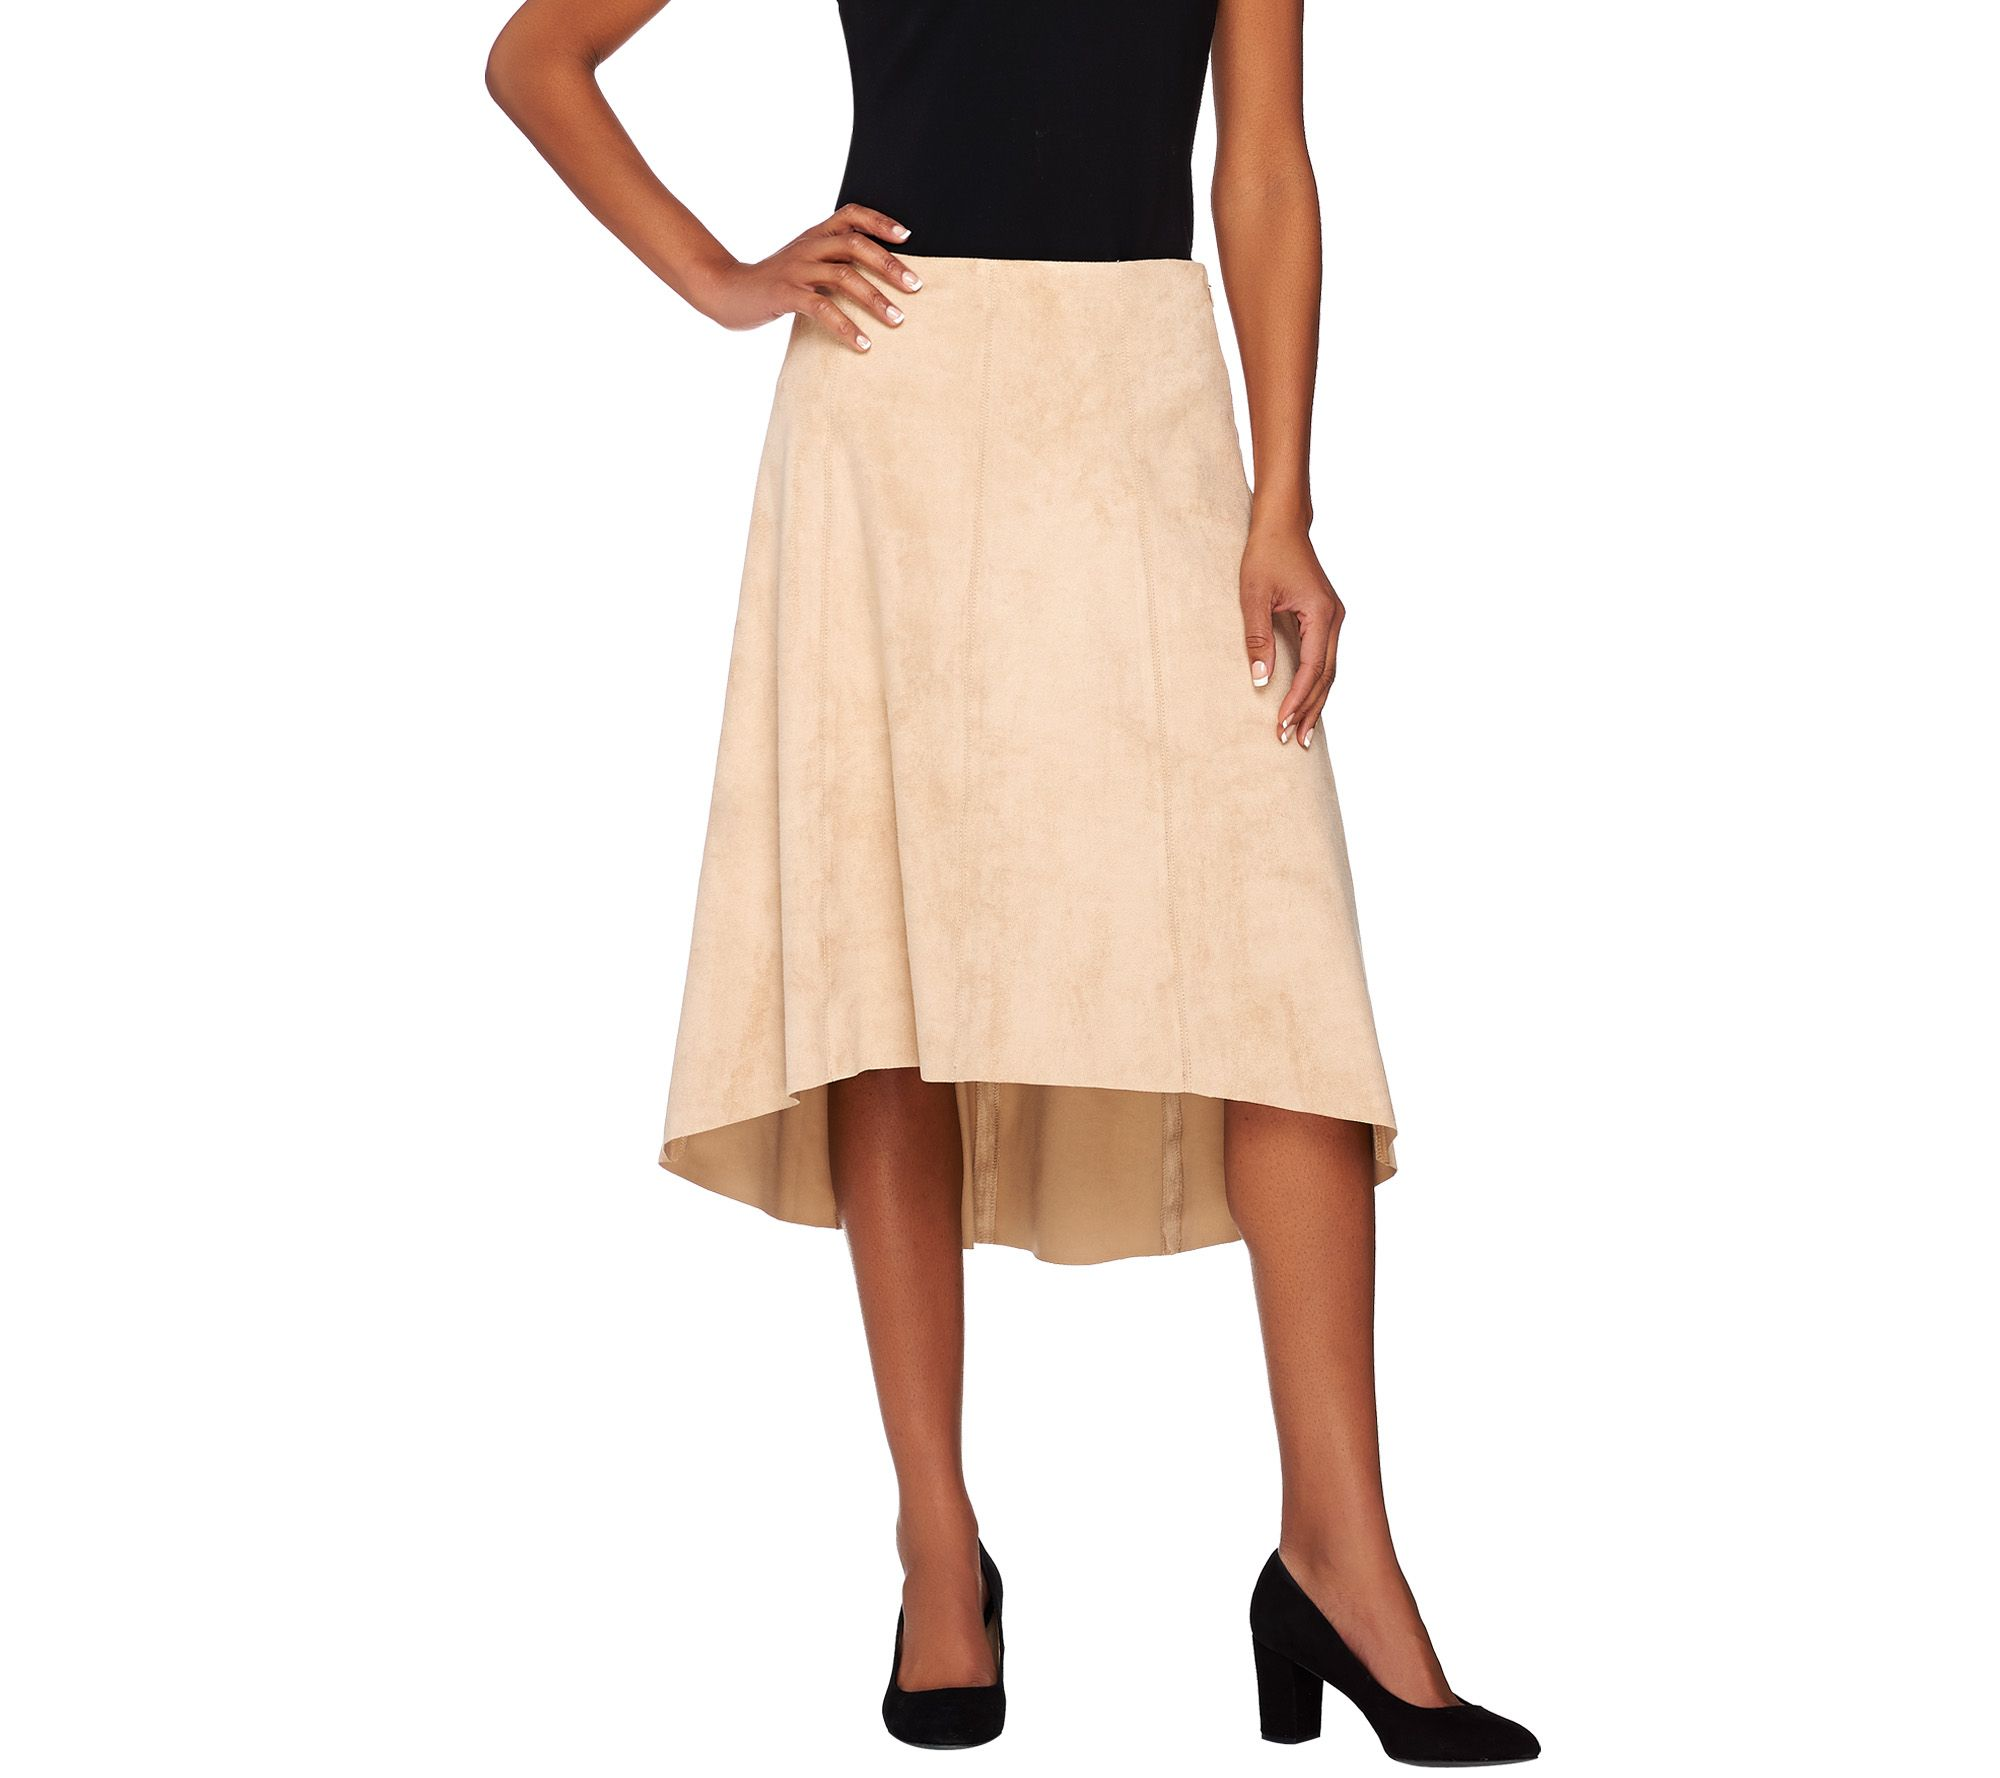 H by Halston — Skirts & Skorts — Dresses & Skirts — Fashion — QVC.com